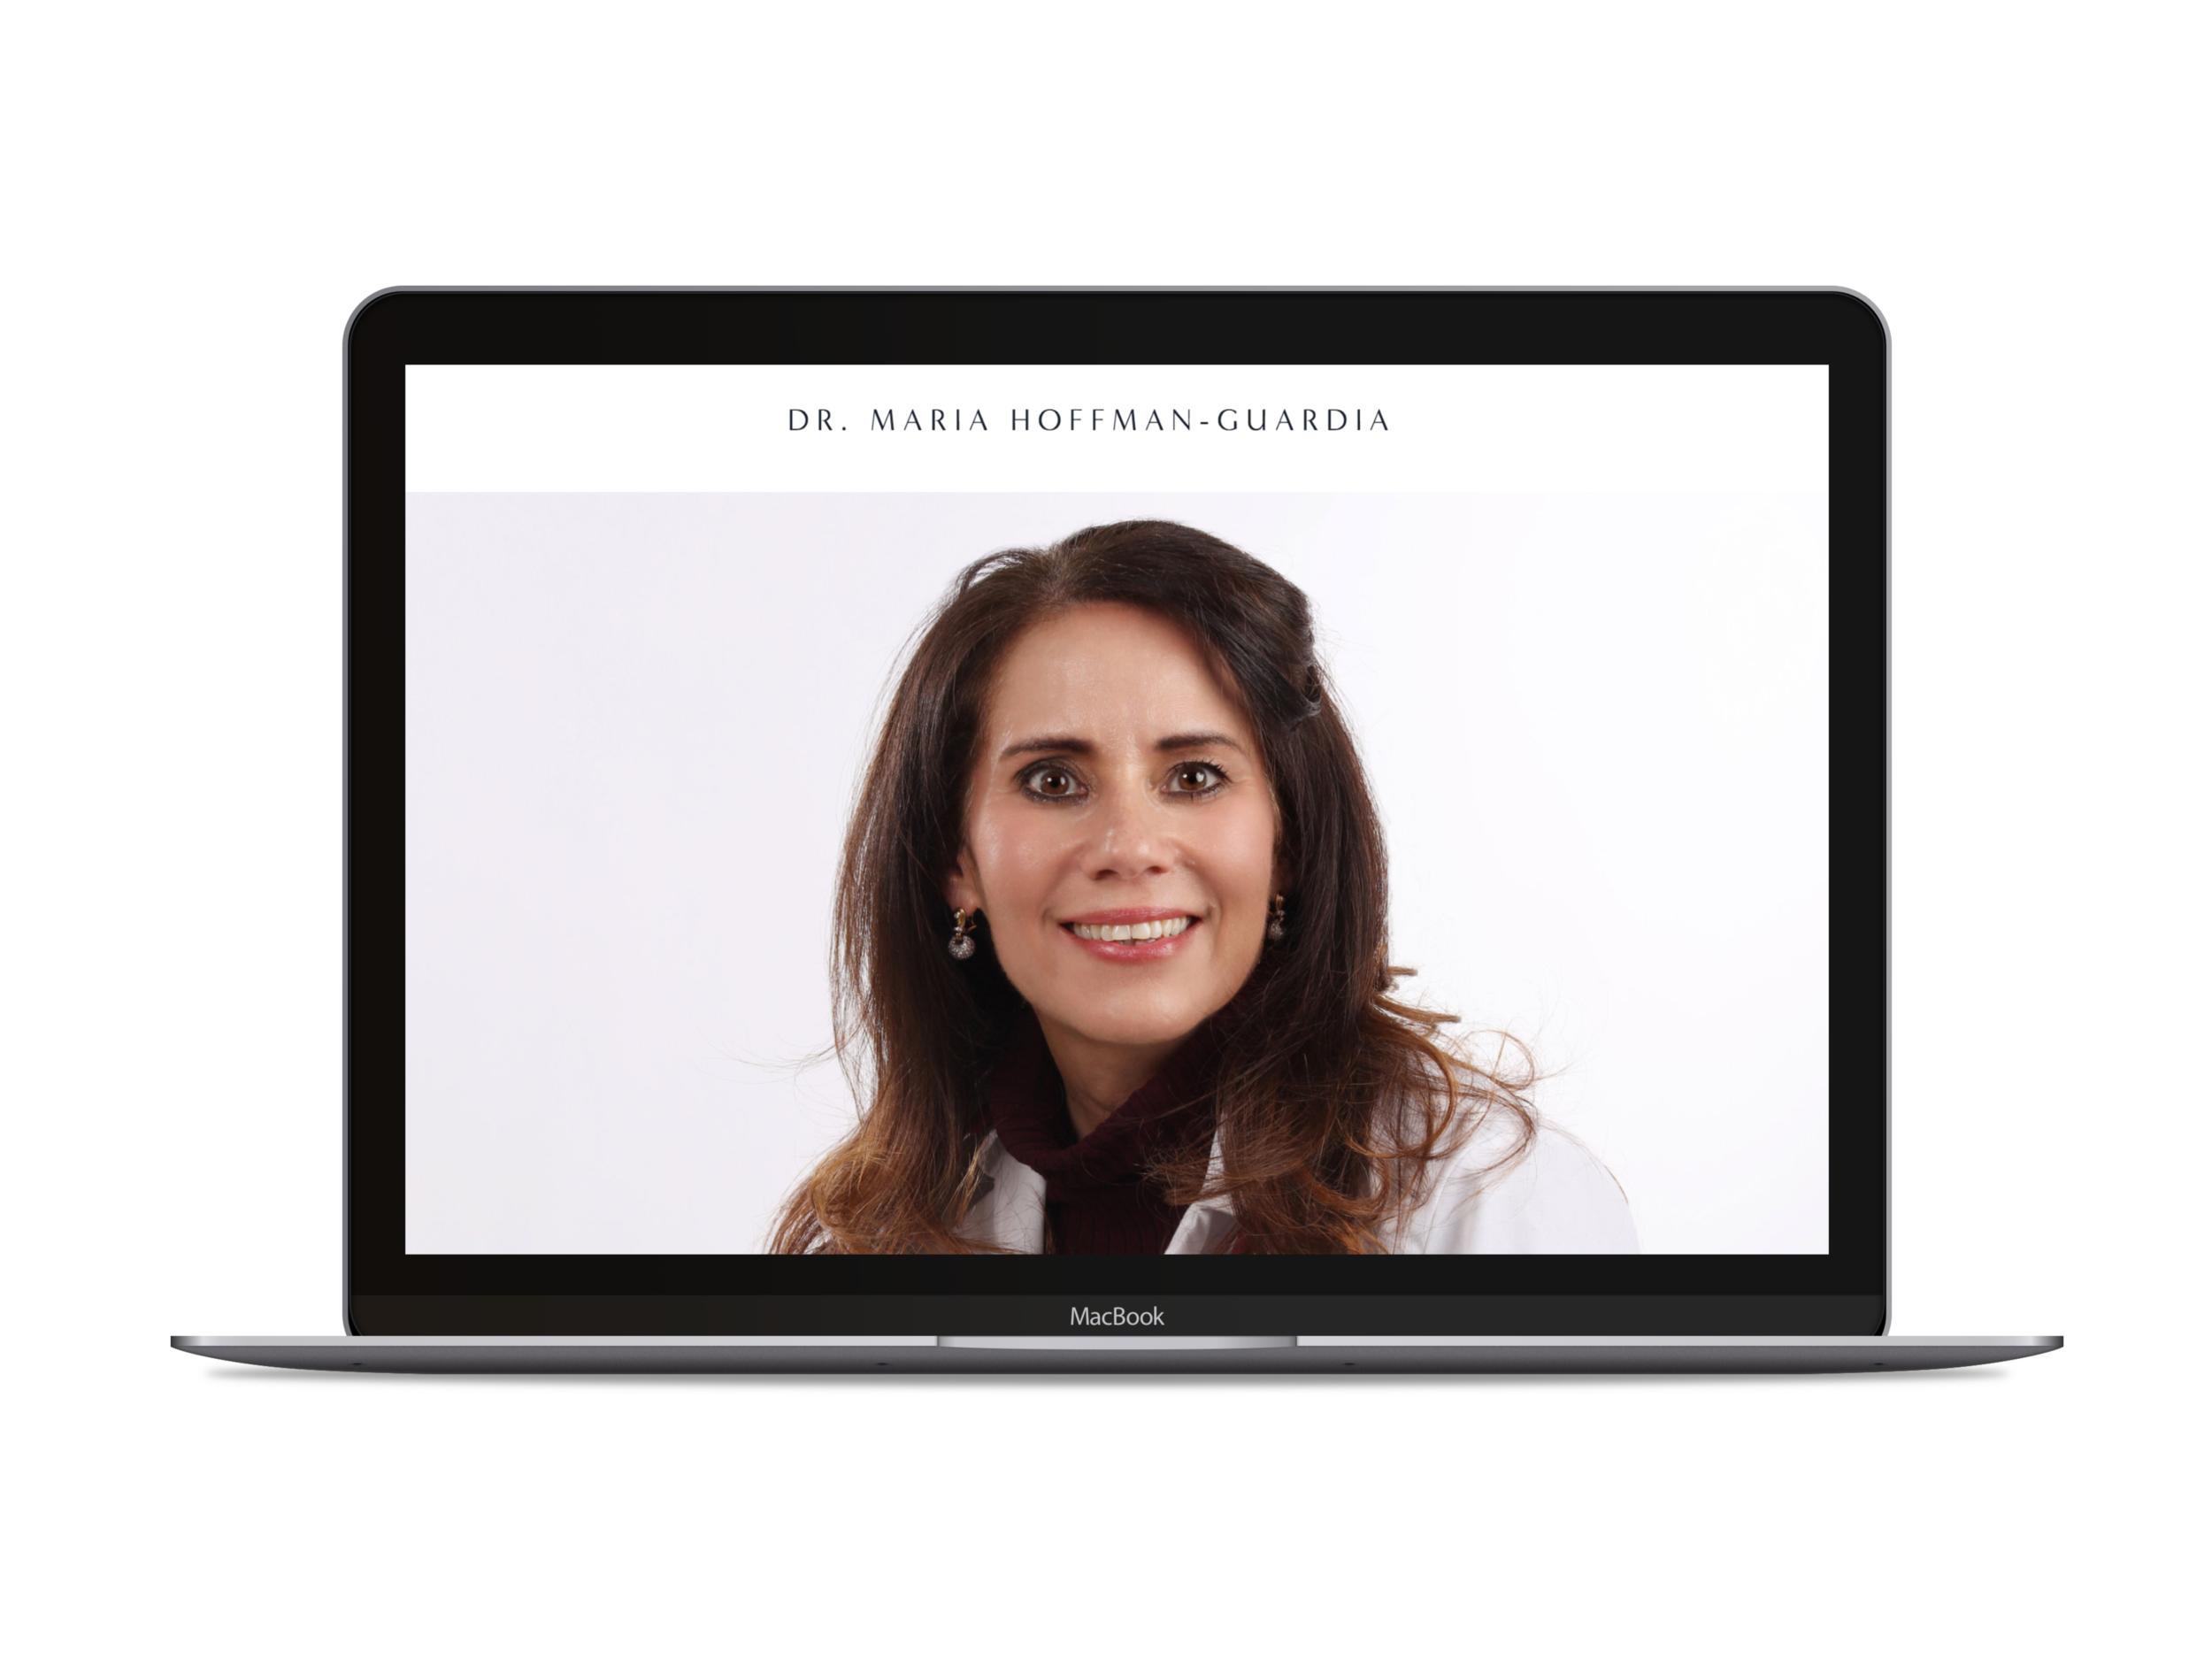 Dr. Maria Hoffman-Guardia